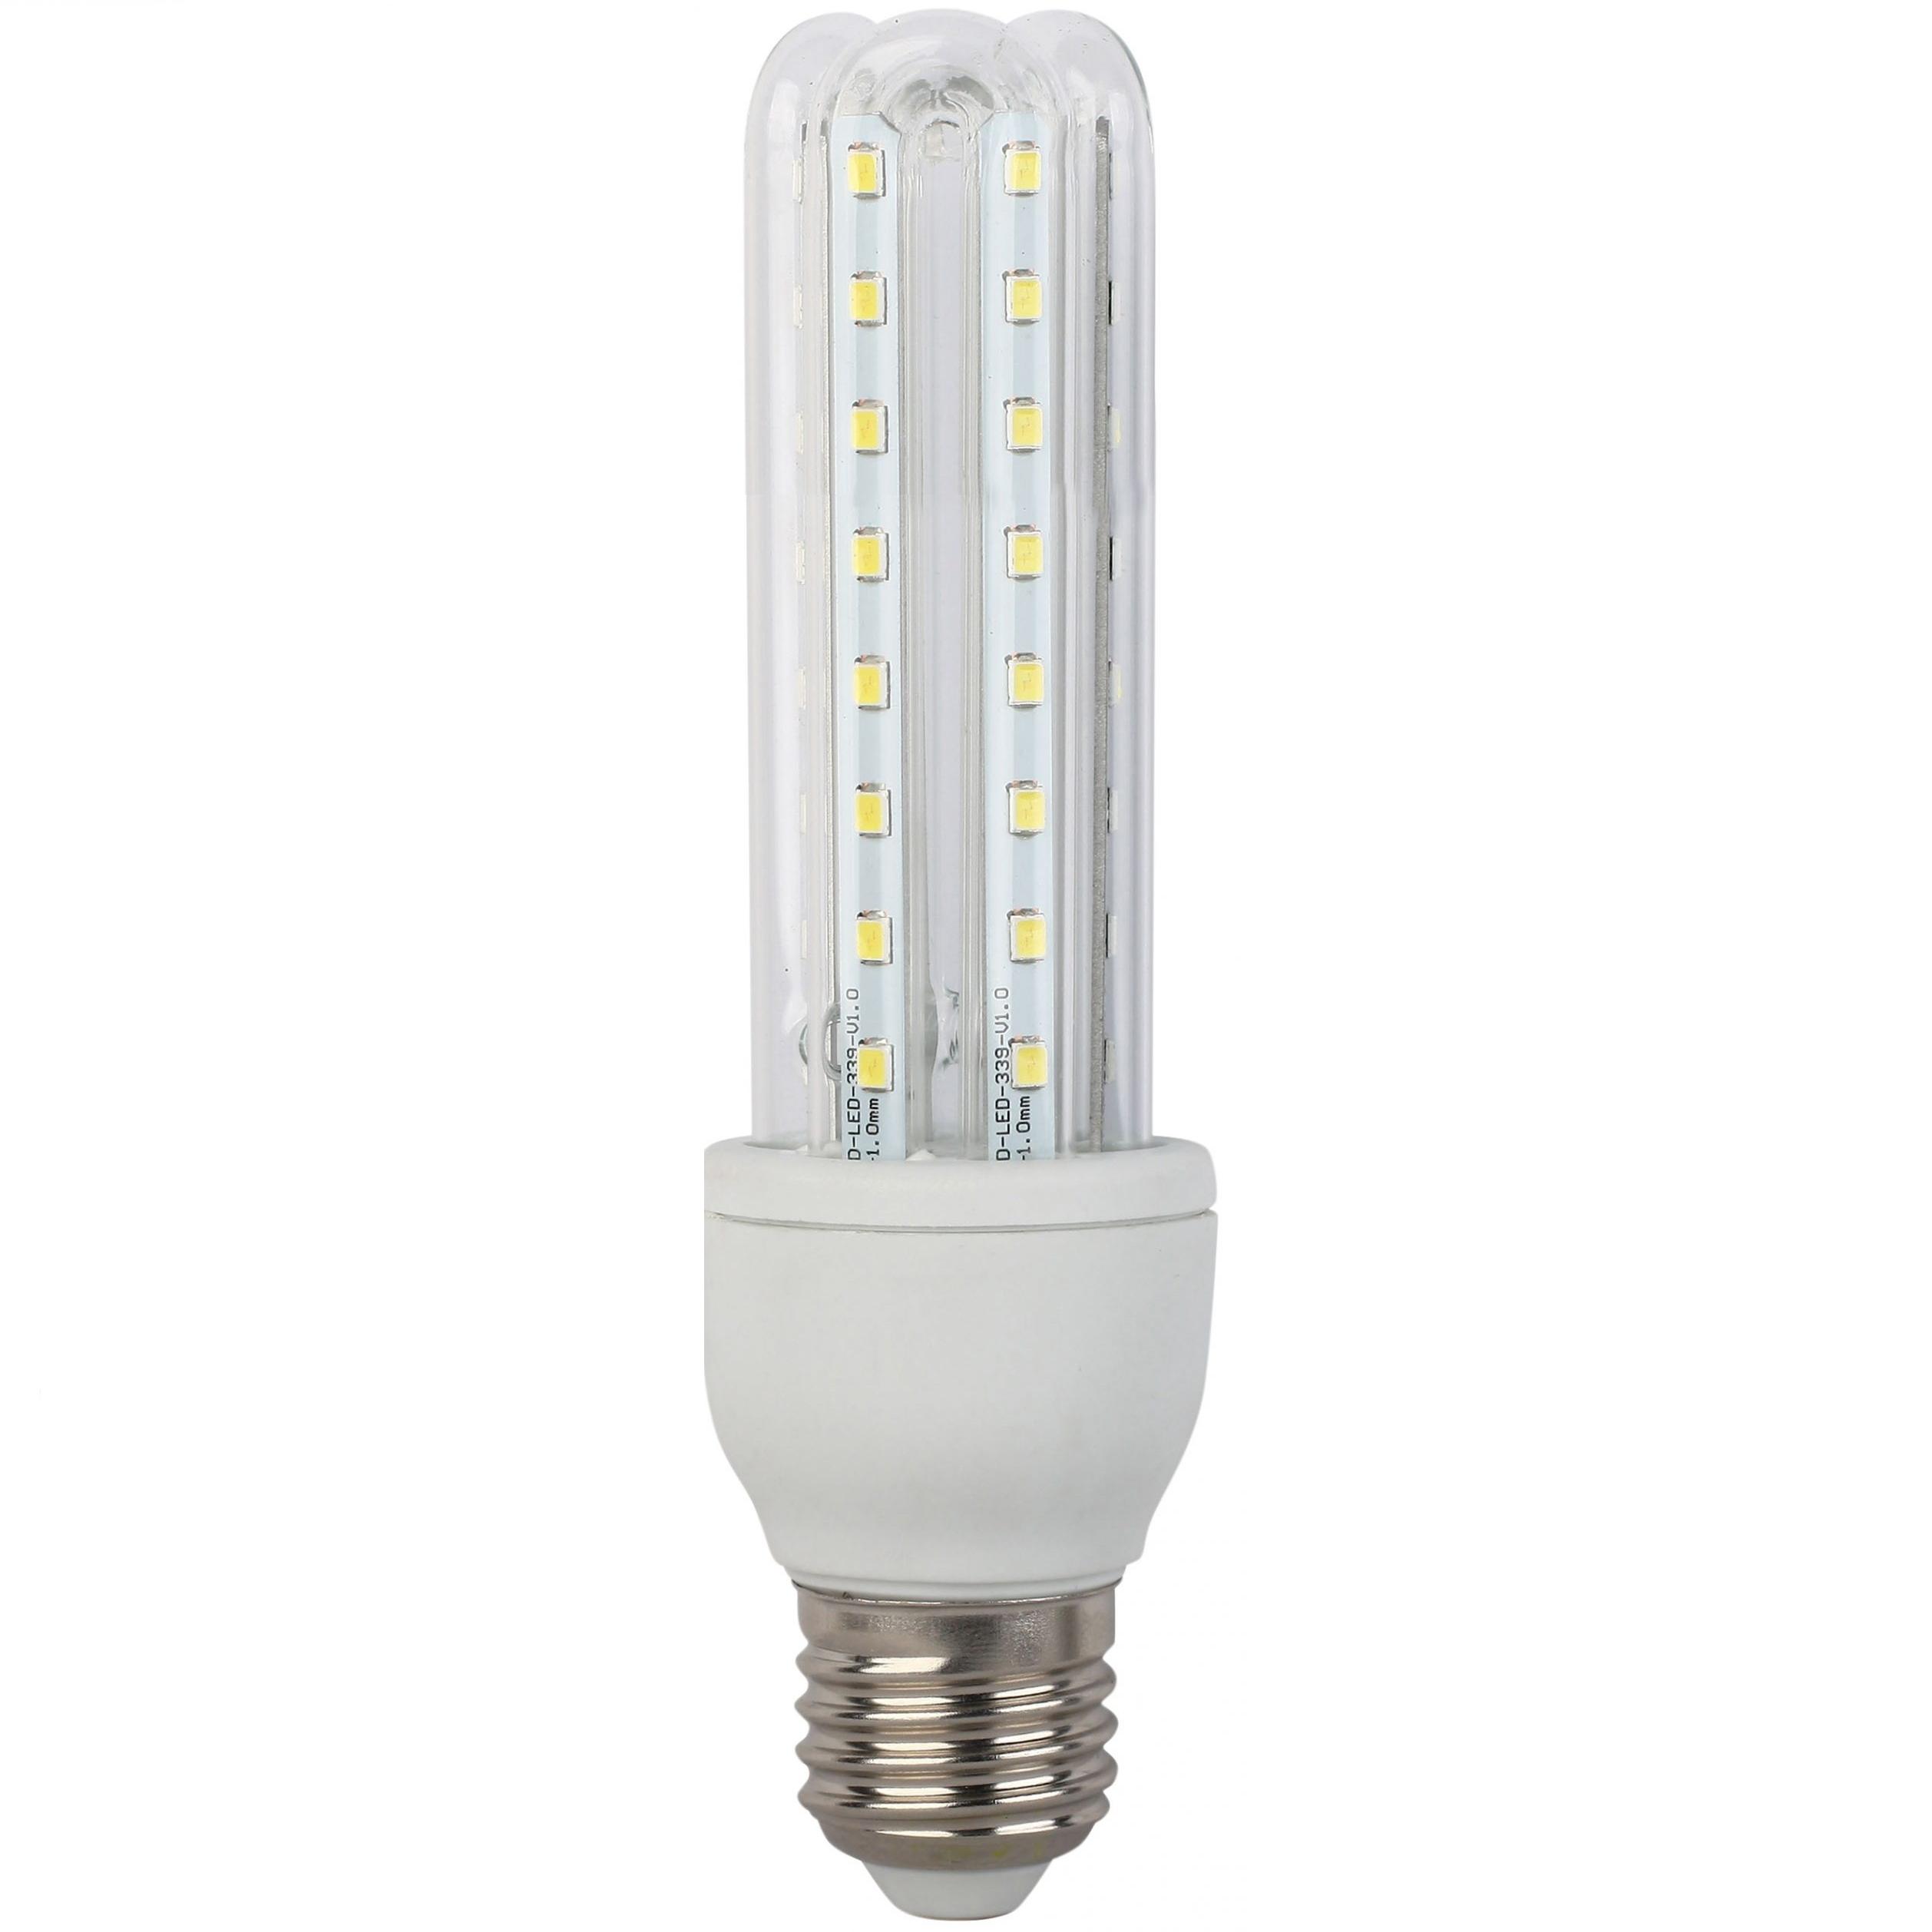 AMPOULE LED 3U-E27-9W-6000K INHK16656S75